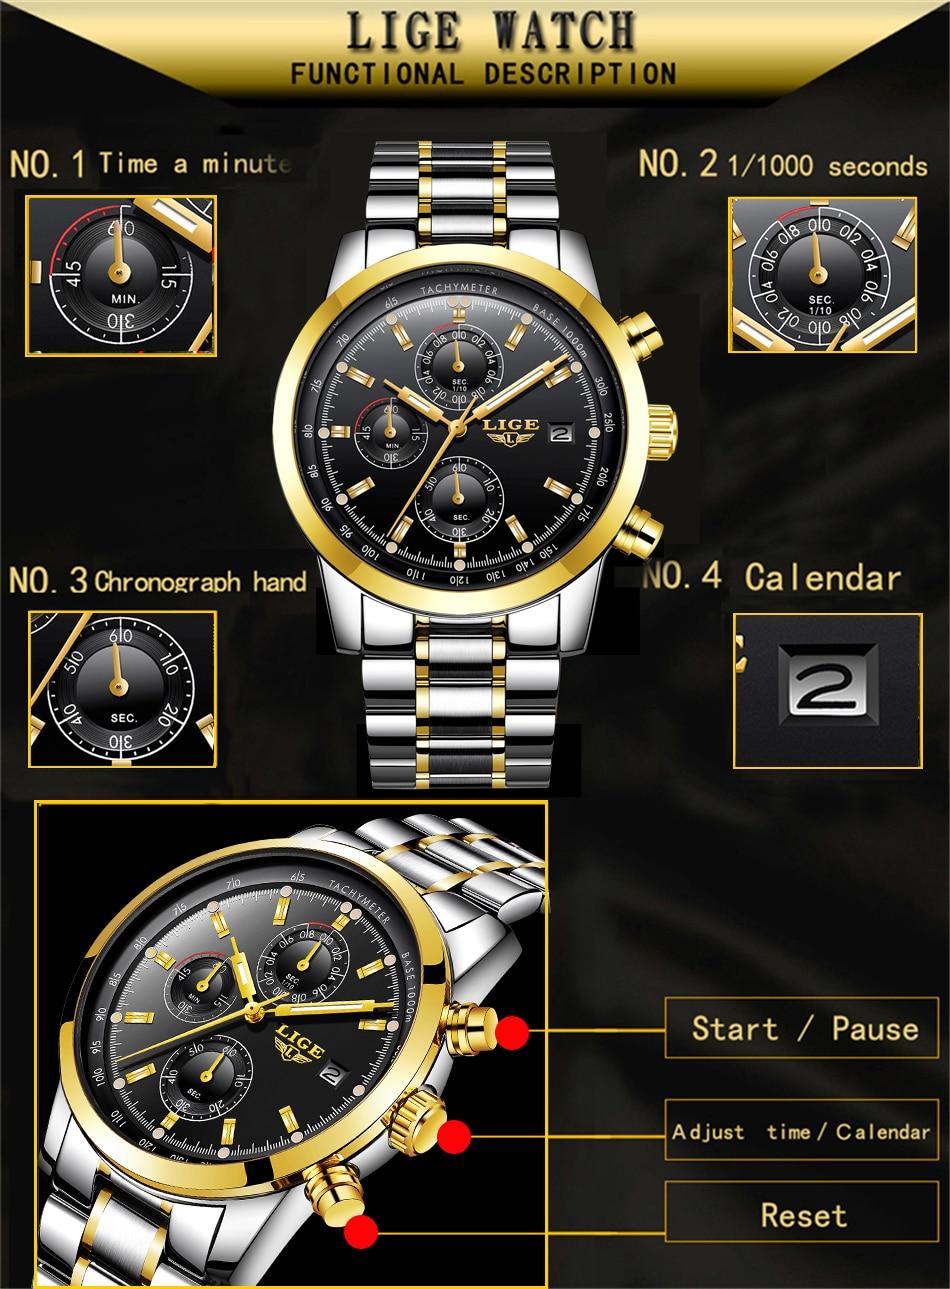 HTB1EqmtflfM8KJjSZFhq6ARyFXa7 - LIGE Mens Watches Top Brand Luxury Business Quartz Watch stainless steel Strap Casual Waterproof Sport Watch Relogio Masculino